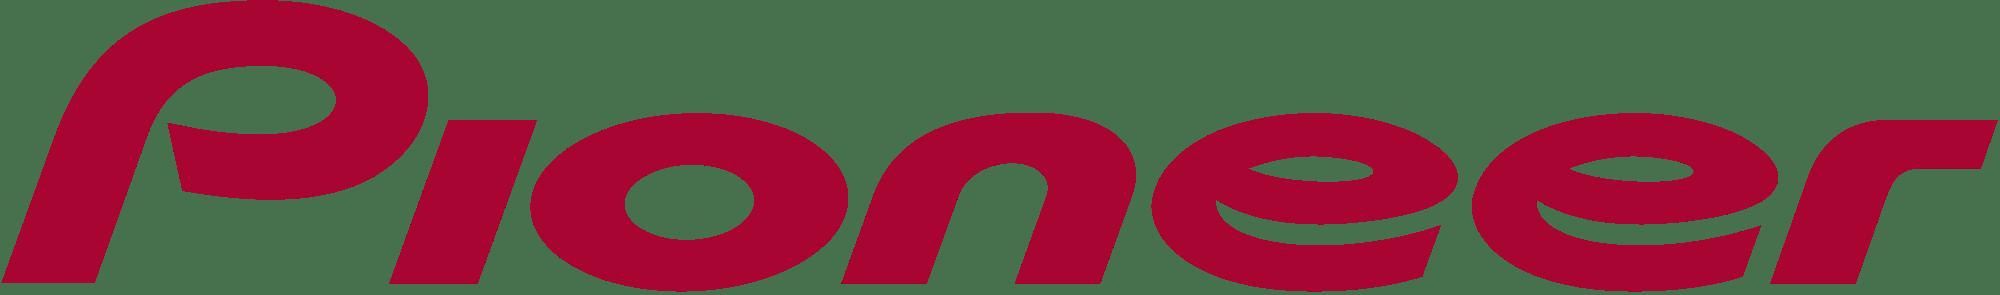 https://0201.nccdn.net/1_2/000/000/0f0/c00/Pioneer-Logo.png